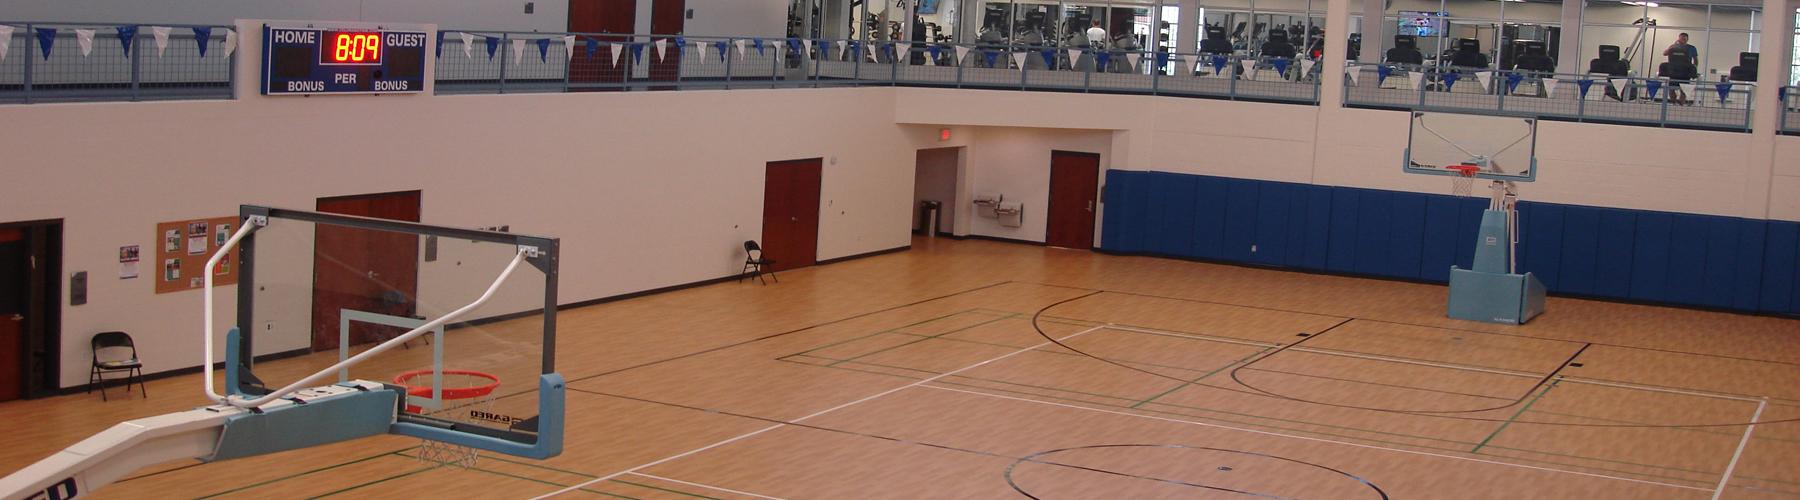 south tampa gym